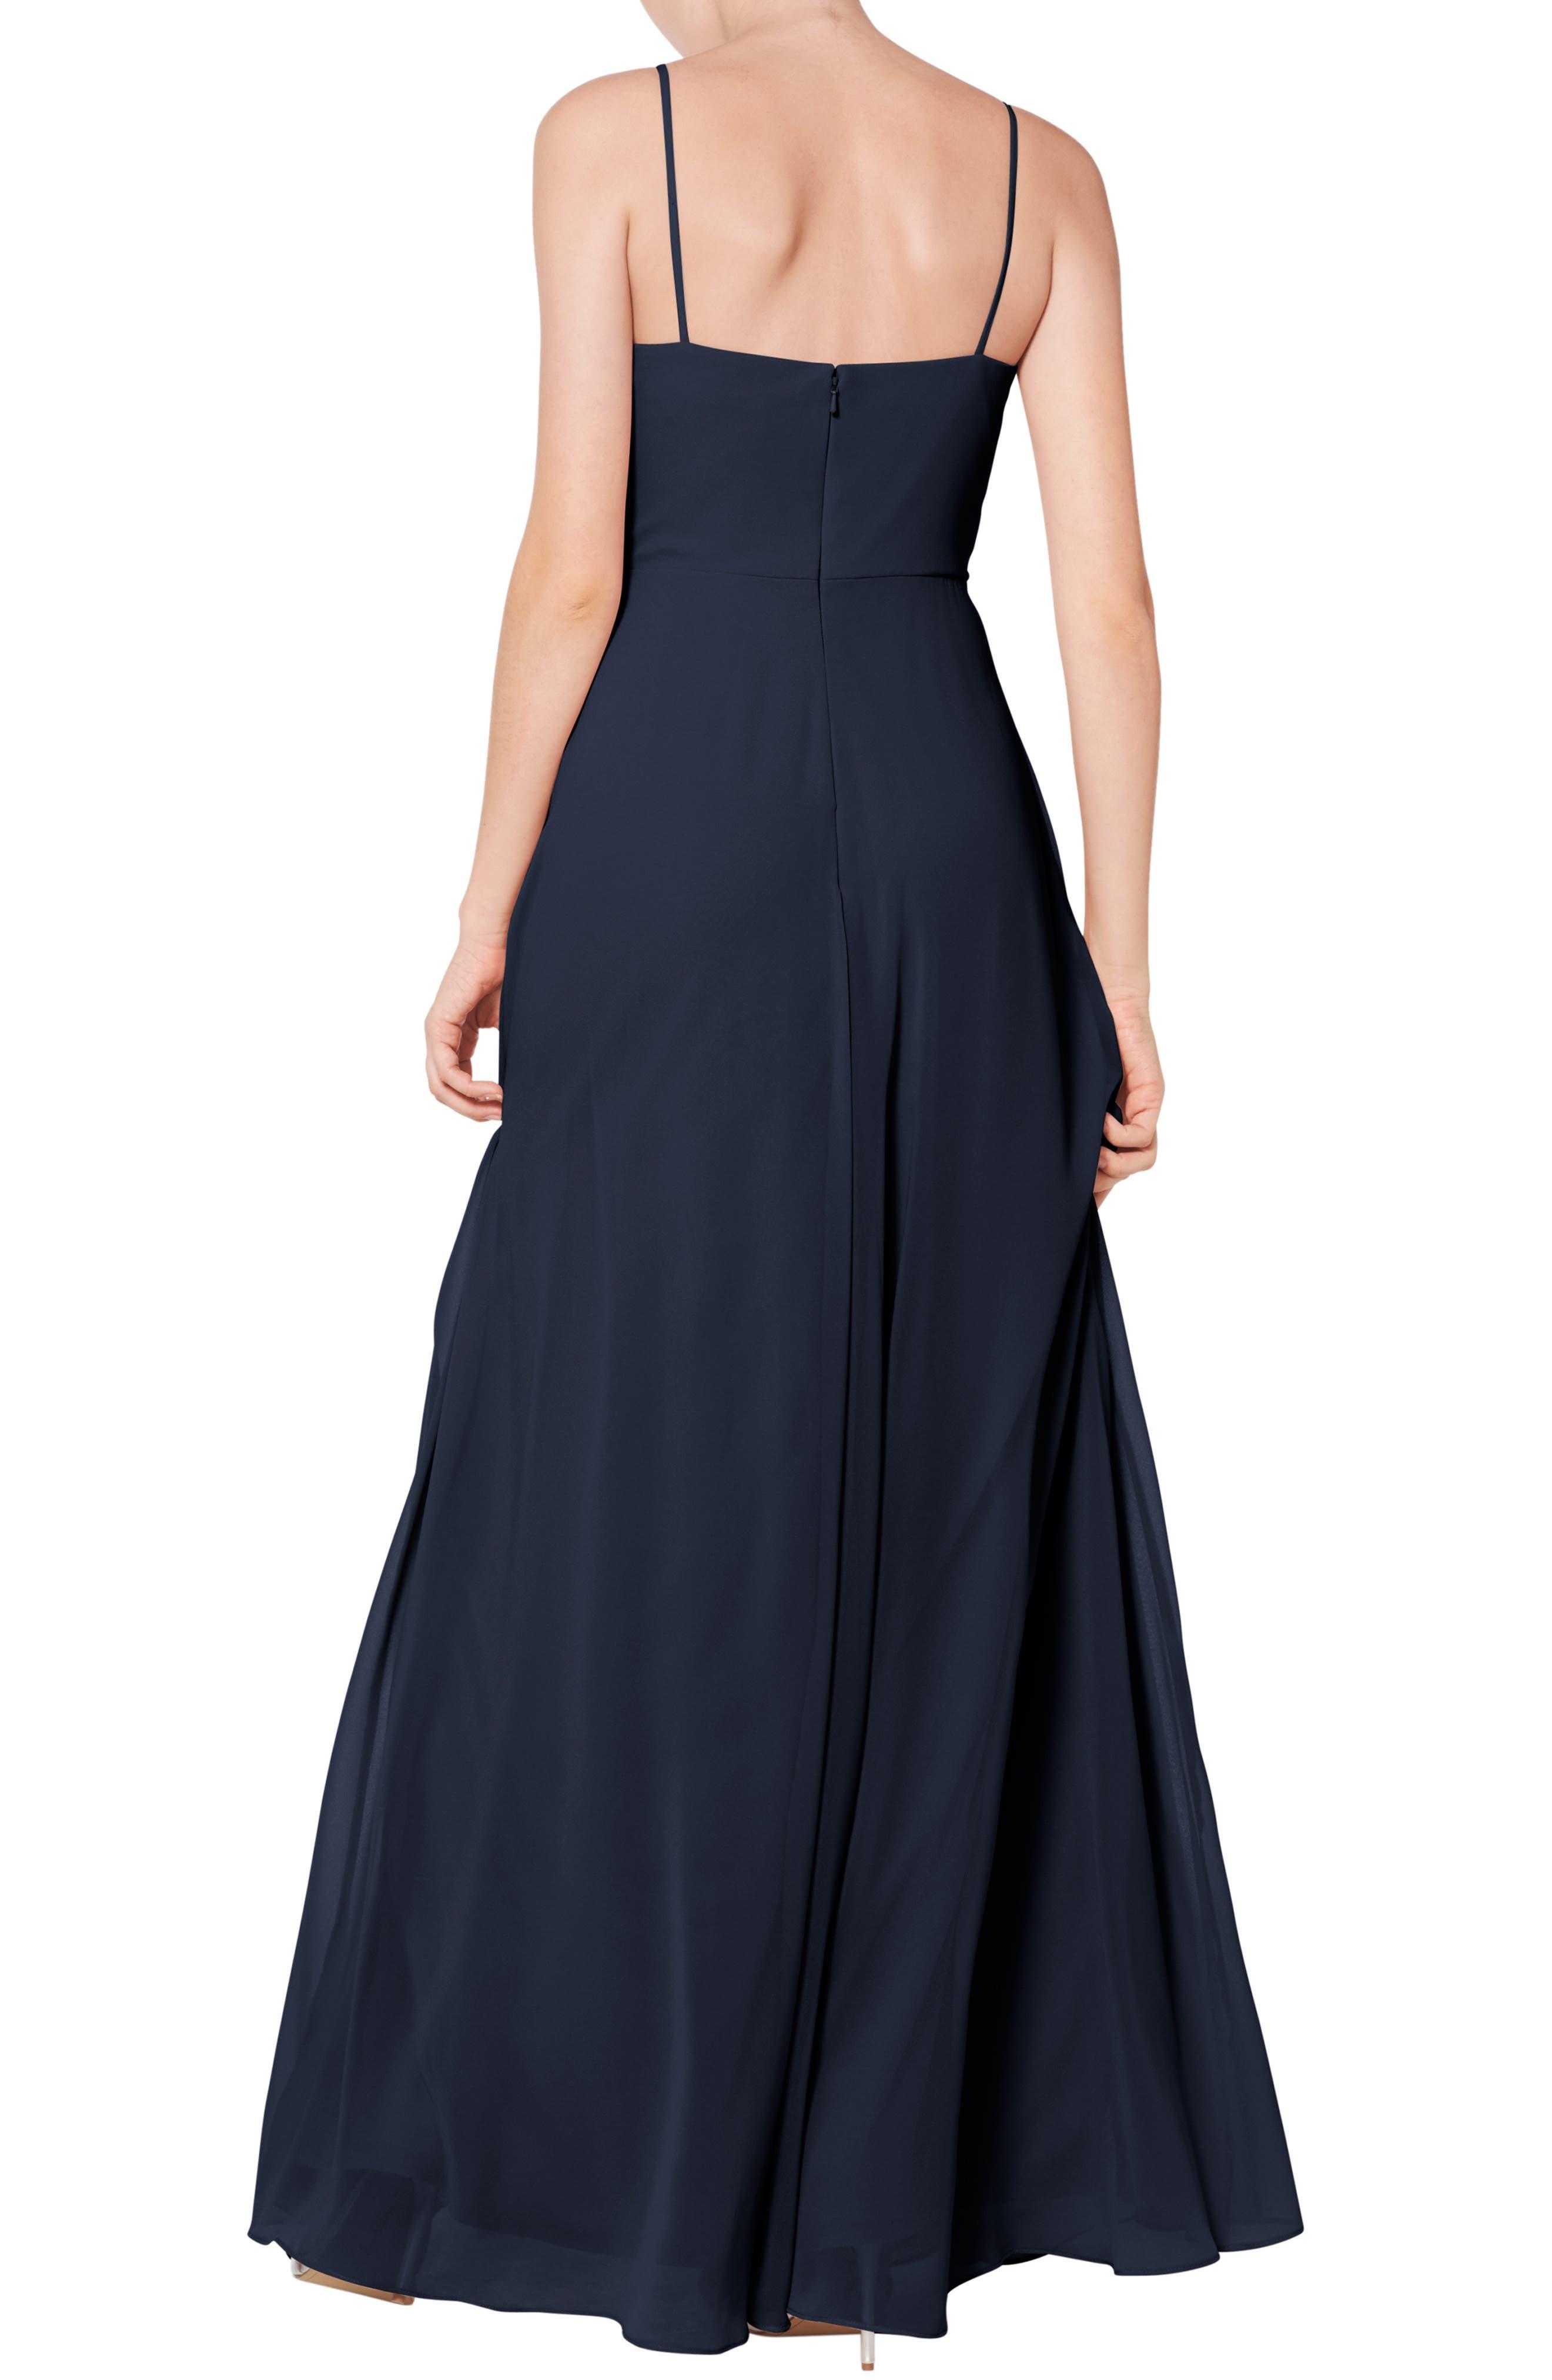 #LEVKOFF, Surplice Neck Chiffon Evening Dress, Alternate thumbnail 2, color, NAVY